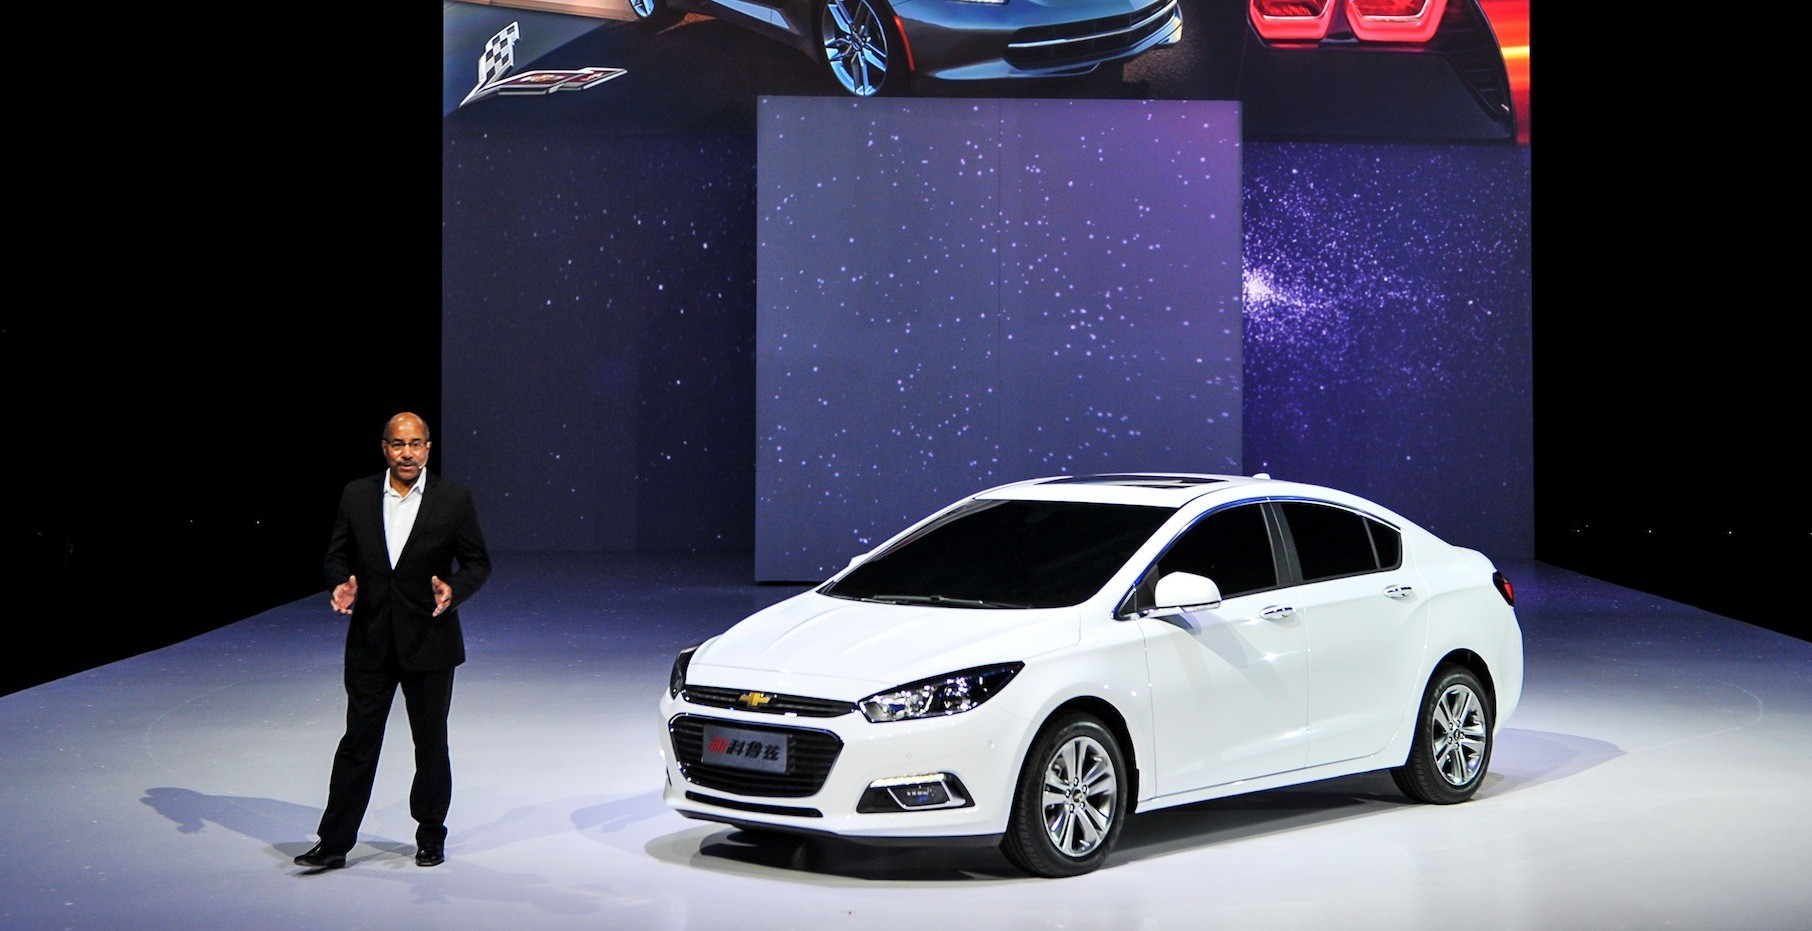 New generation Chevrolet Cruze unveiled- Beijing Motor Show